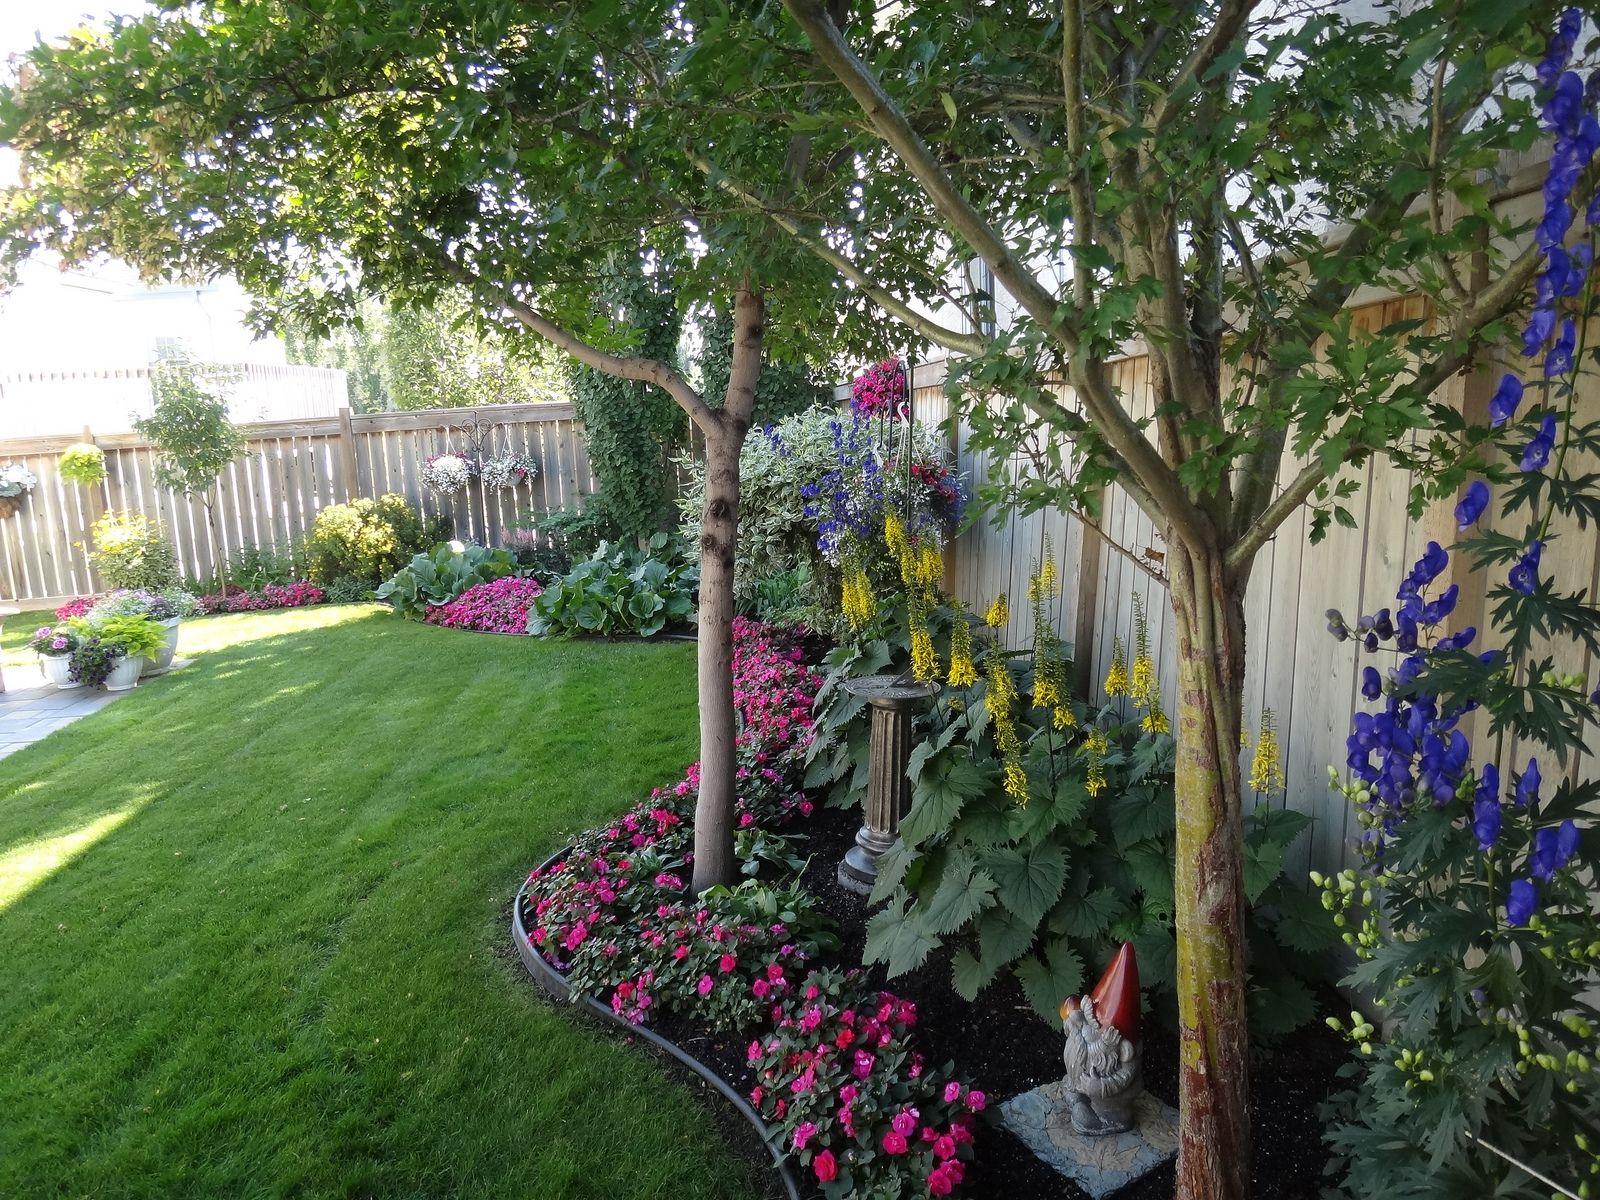 DSC00557 | Landscaping along fence, Fence landscaping ... on Backyard Landscaping Along Fence id=61937